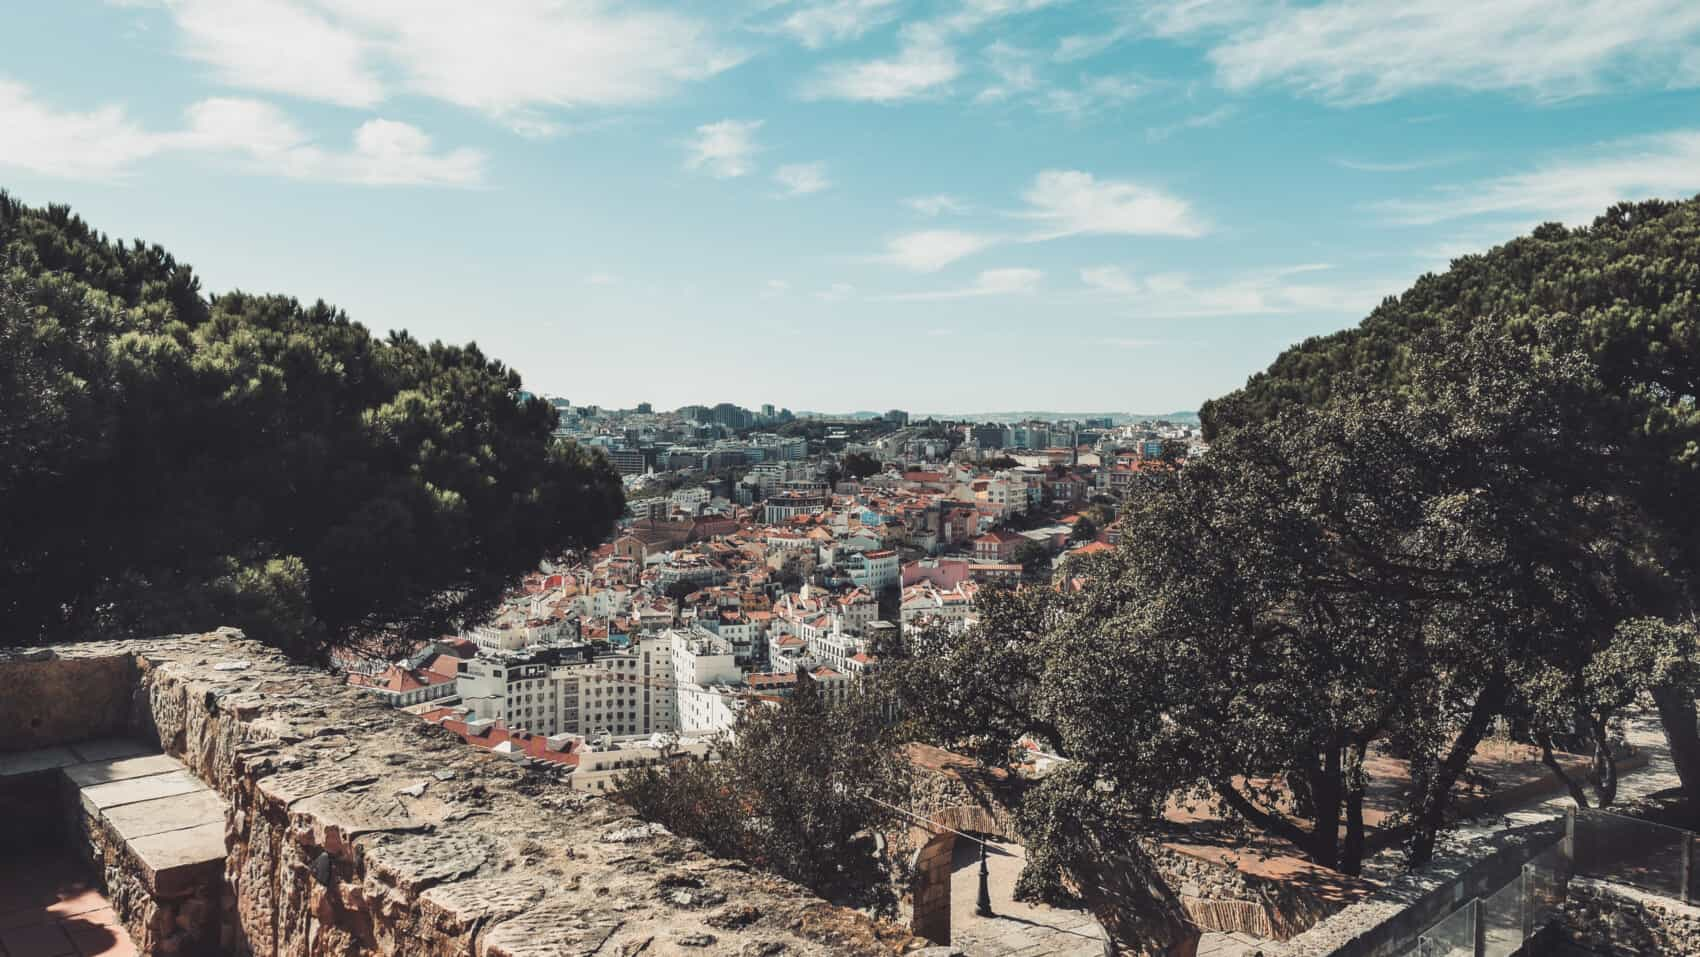 Chateau saint george Lisbonne